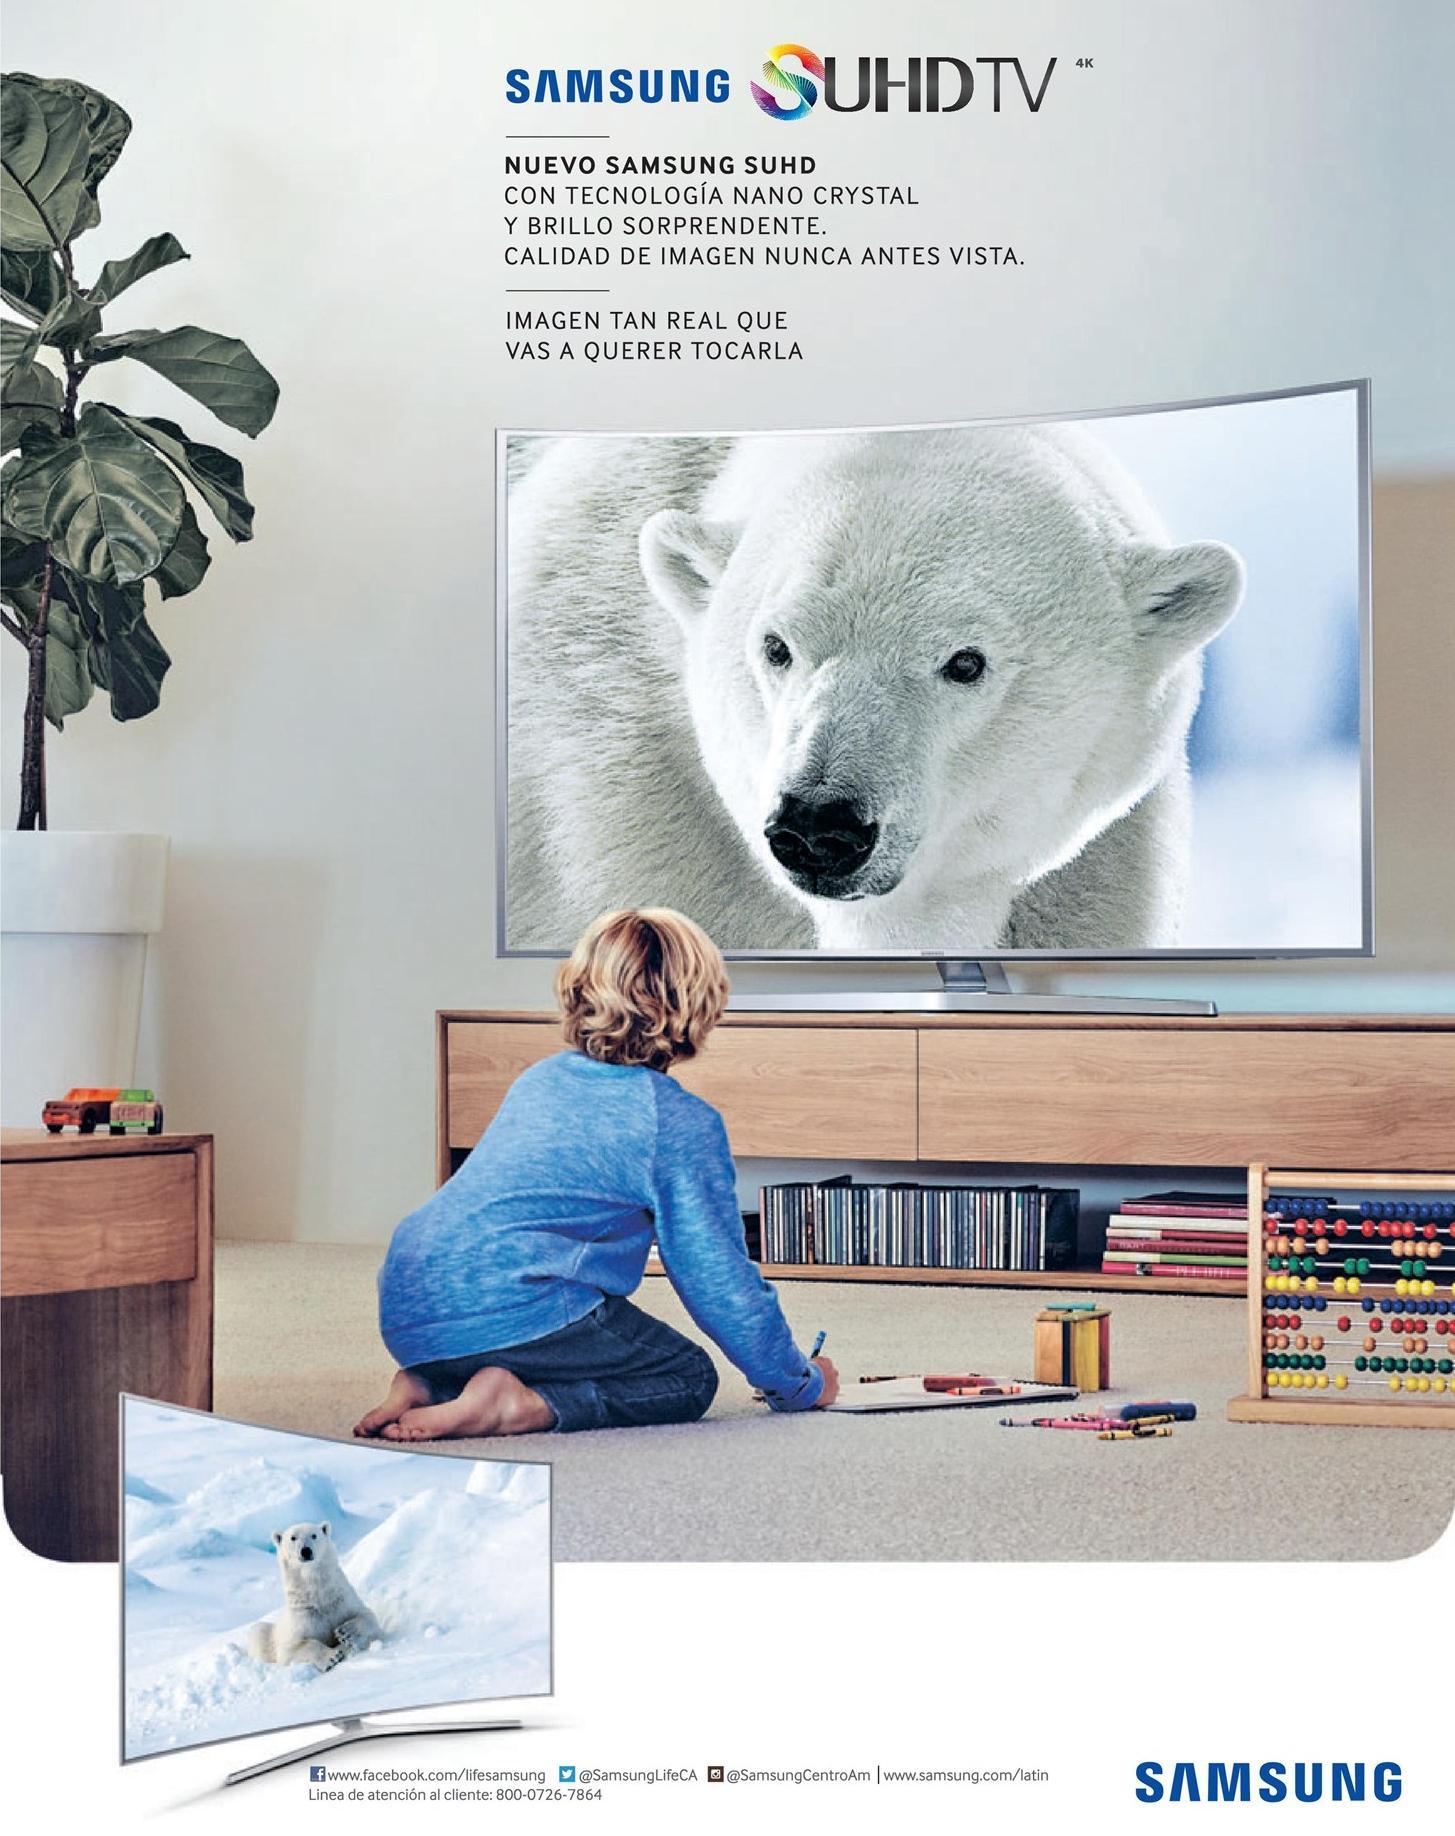 new high definition screen SAMSUNG SUHDTV nano crystal